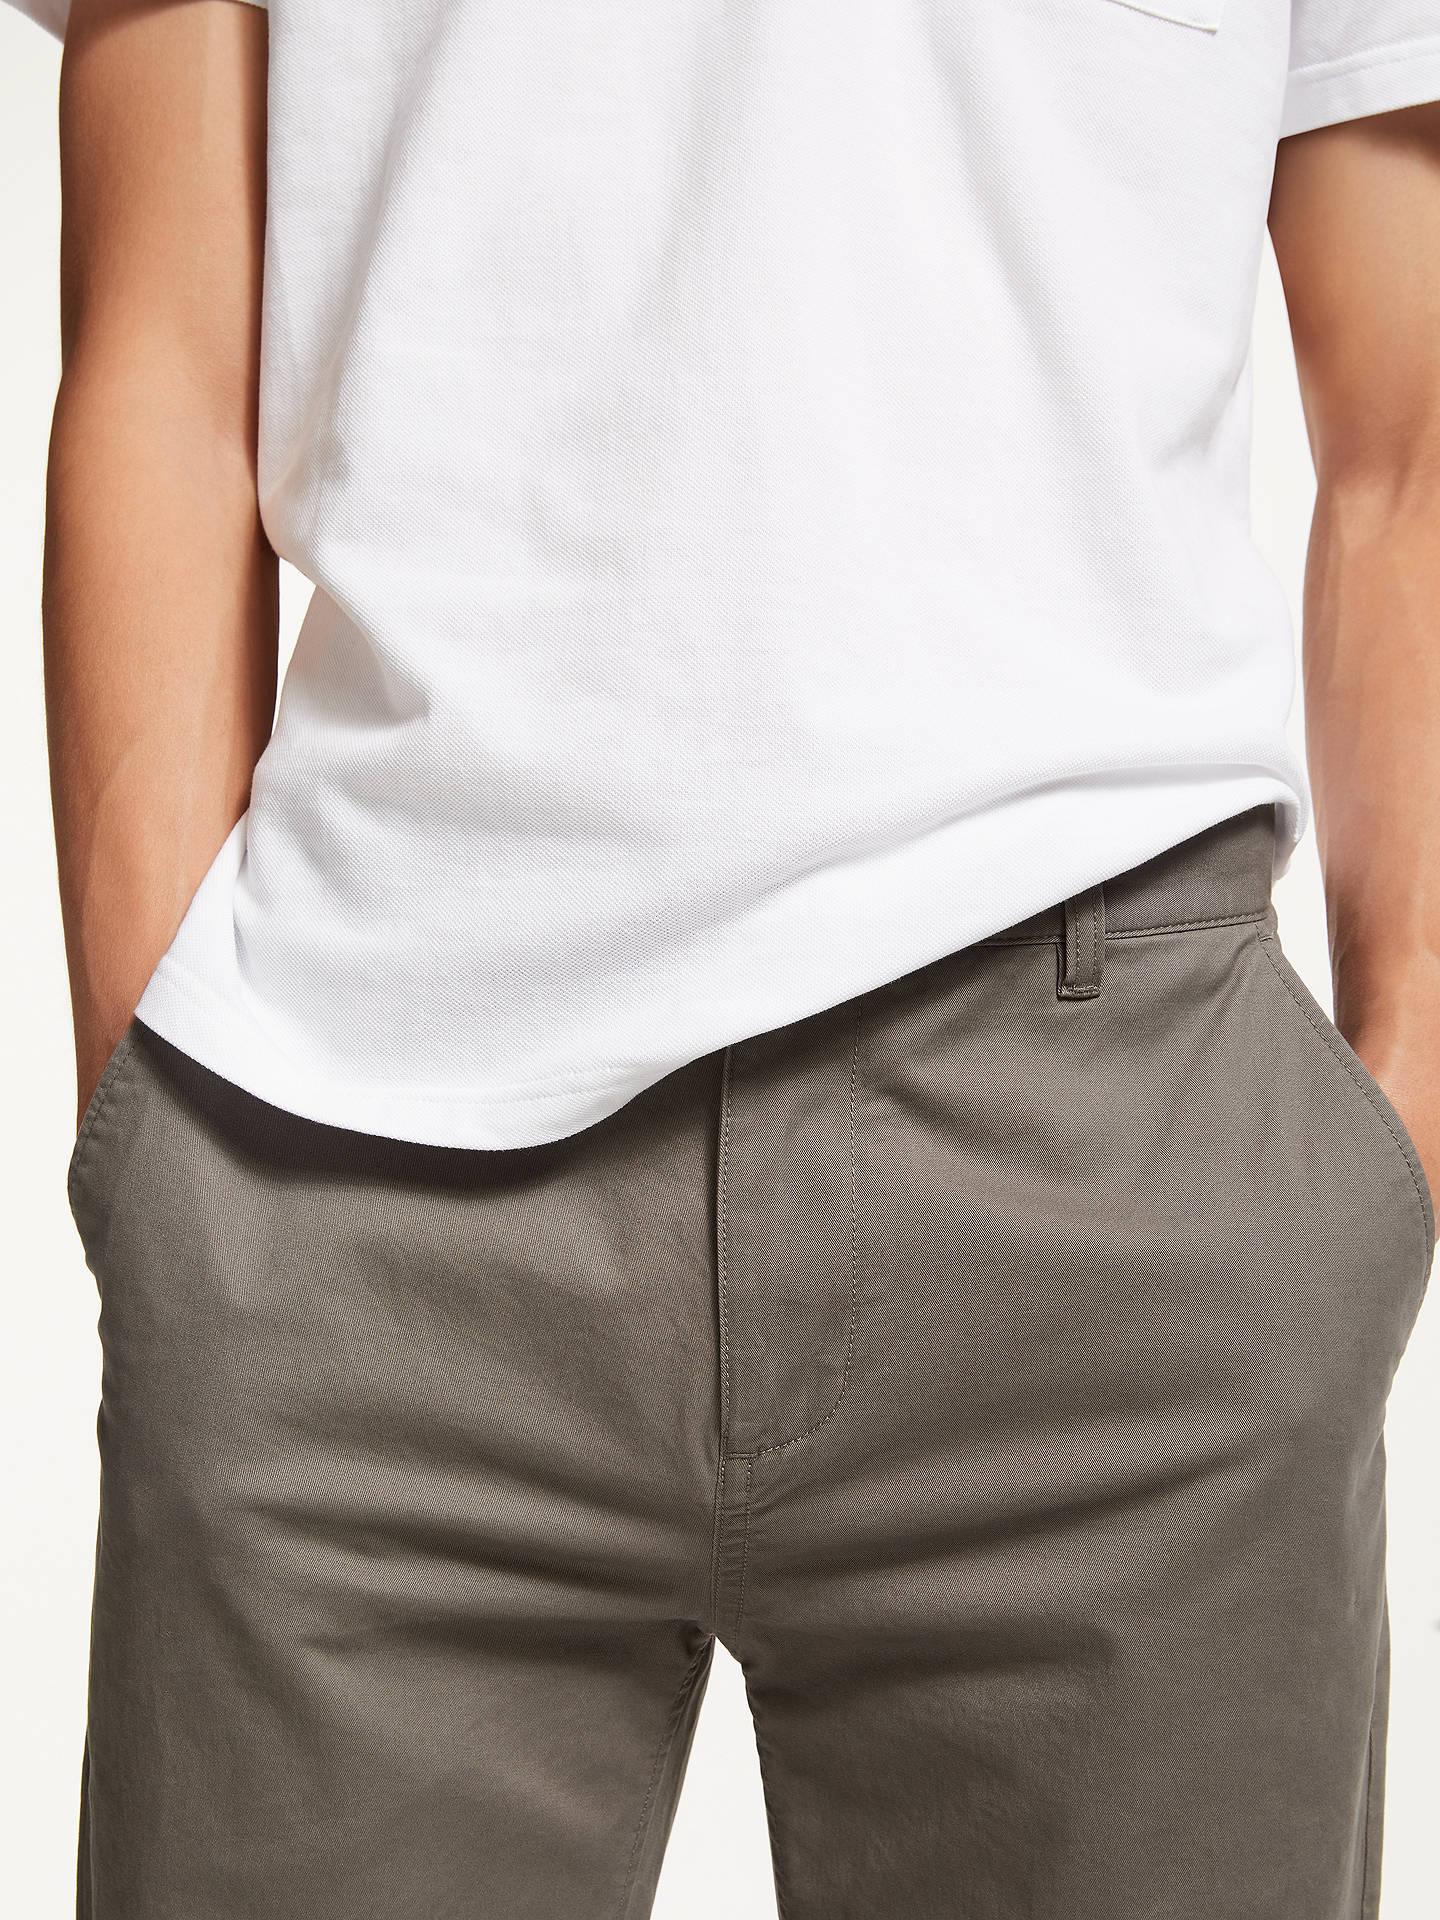 Kin Stretch Cotton Chinos At John Lewis Partners Tendencies Navy Short 30 Buykin Grey 32s Online